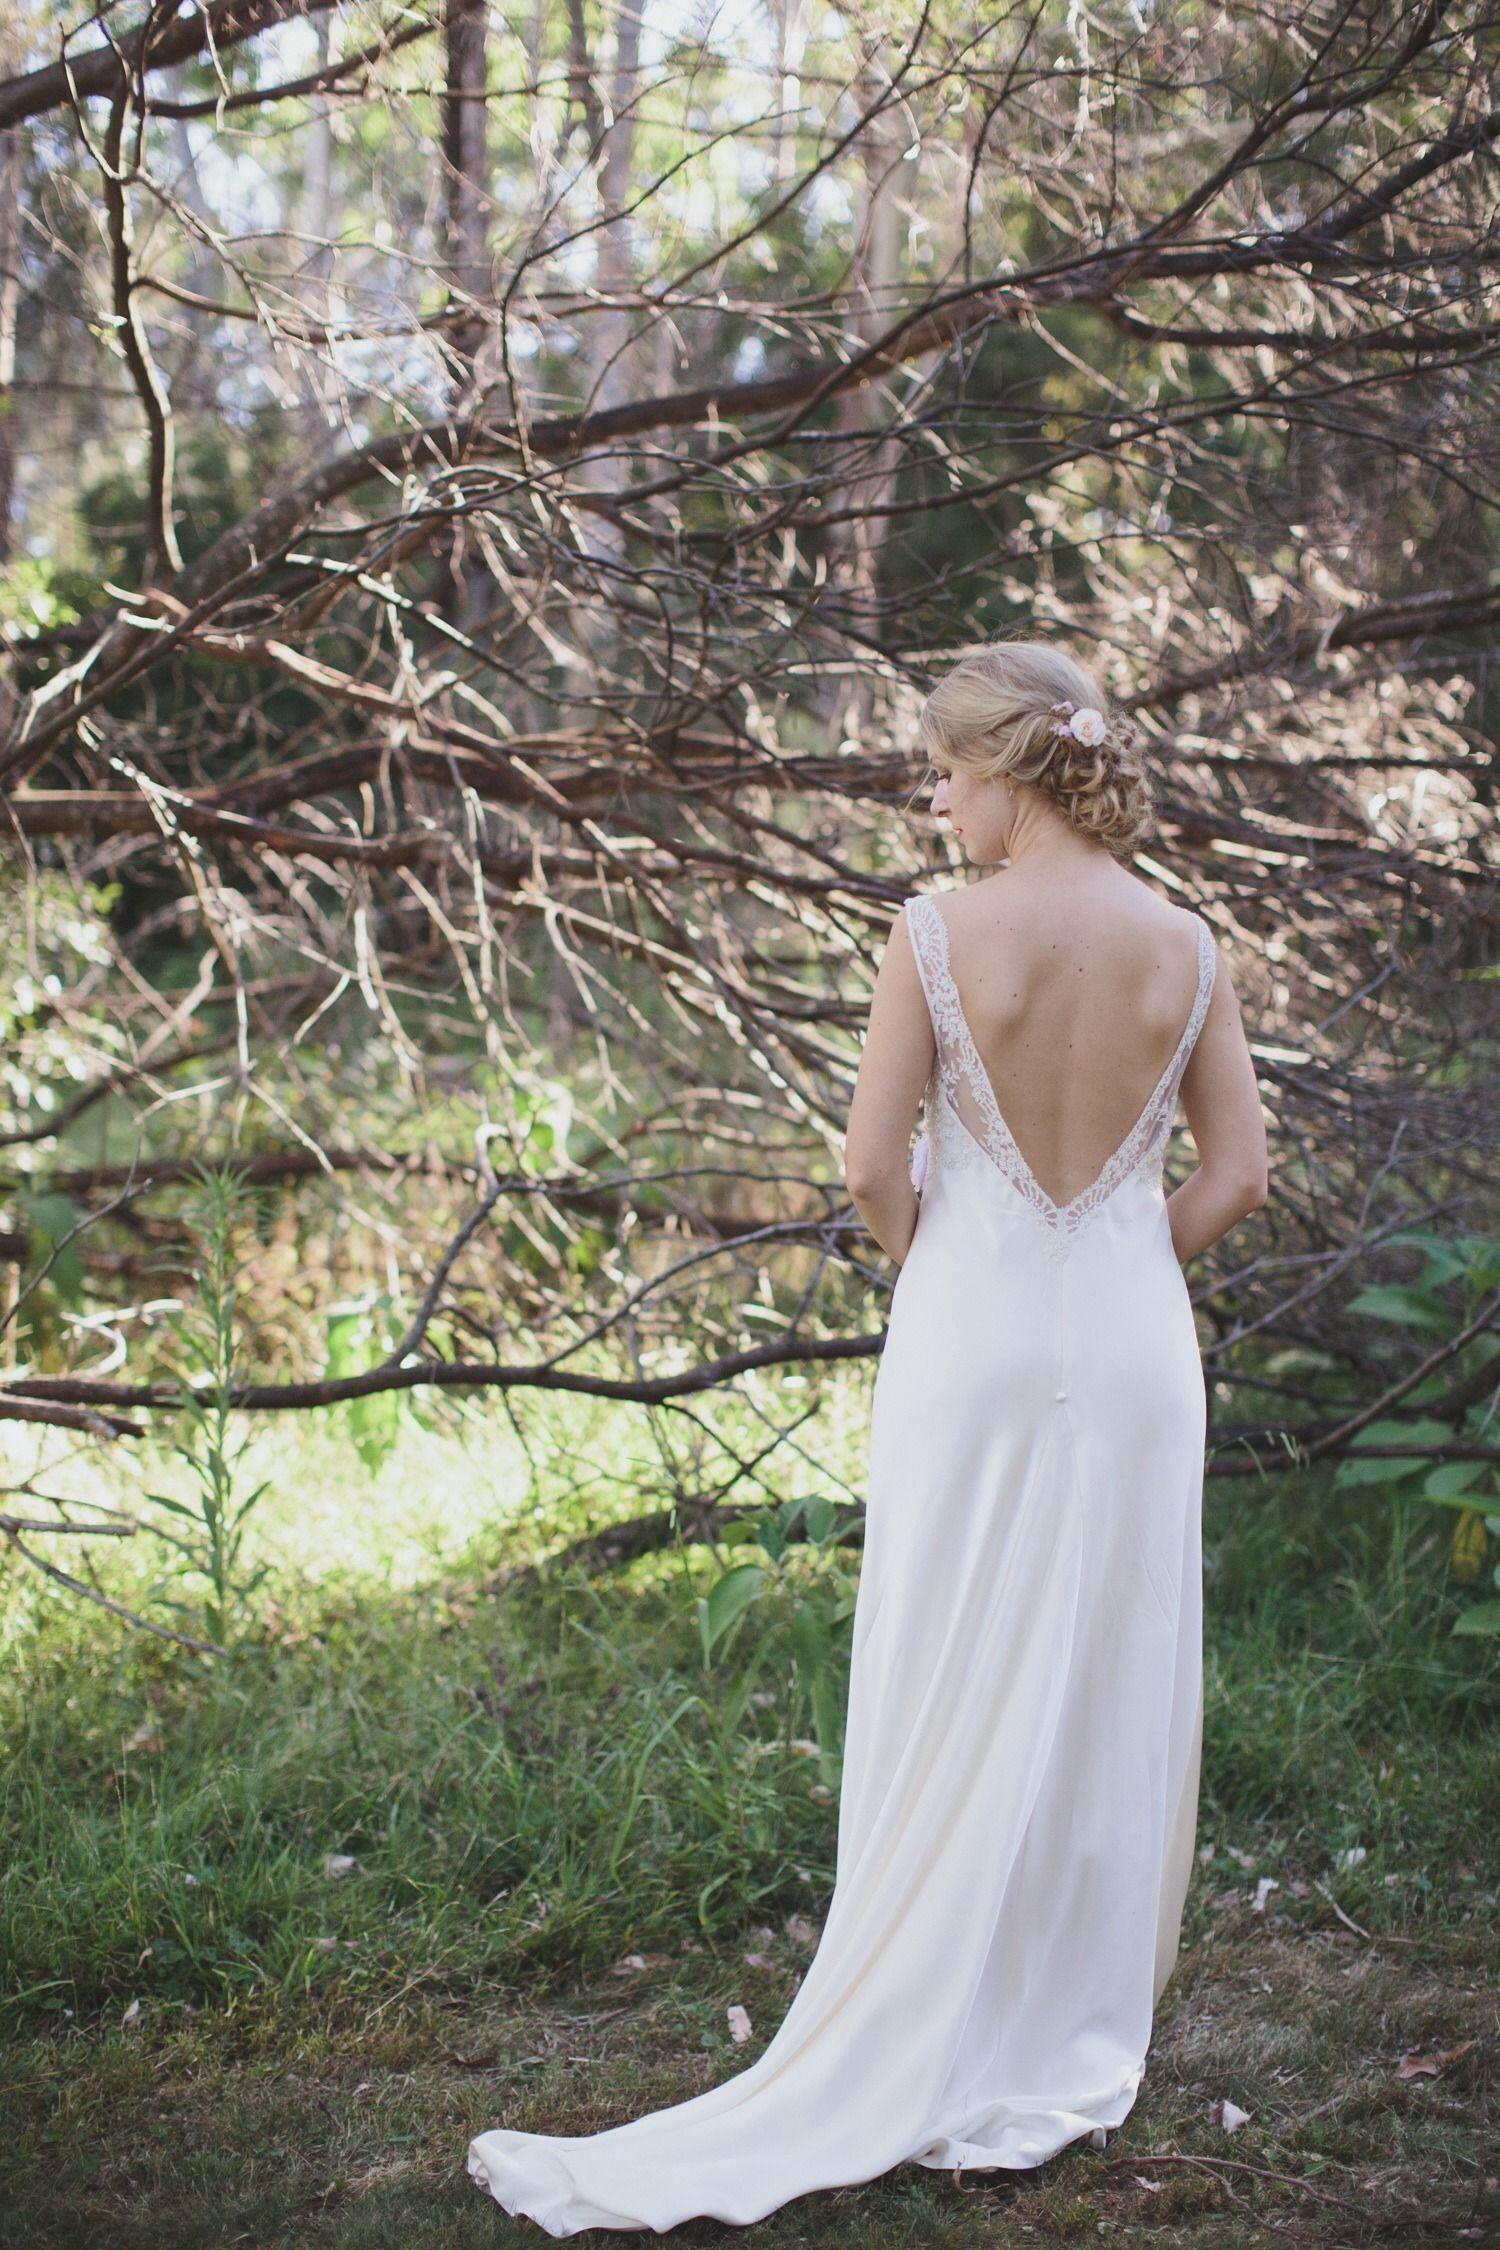 Gown gorgeousness. Photography: Rachael Muller  - rachaelmuller.com, Gown: Lilli Marcs http://www.lillimarcs.com.au  Read More: http://www.stylemepretty.com/australia-weddings/2014/06/19/romantic-sydney-wedding/